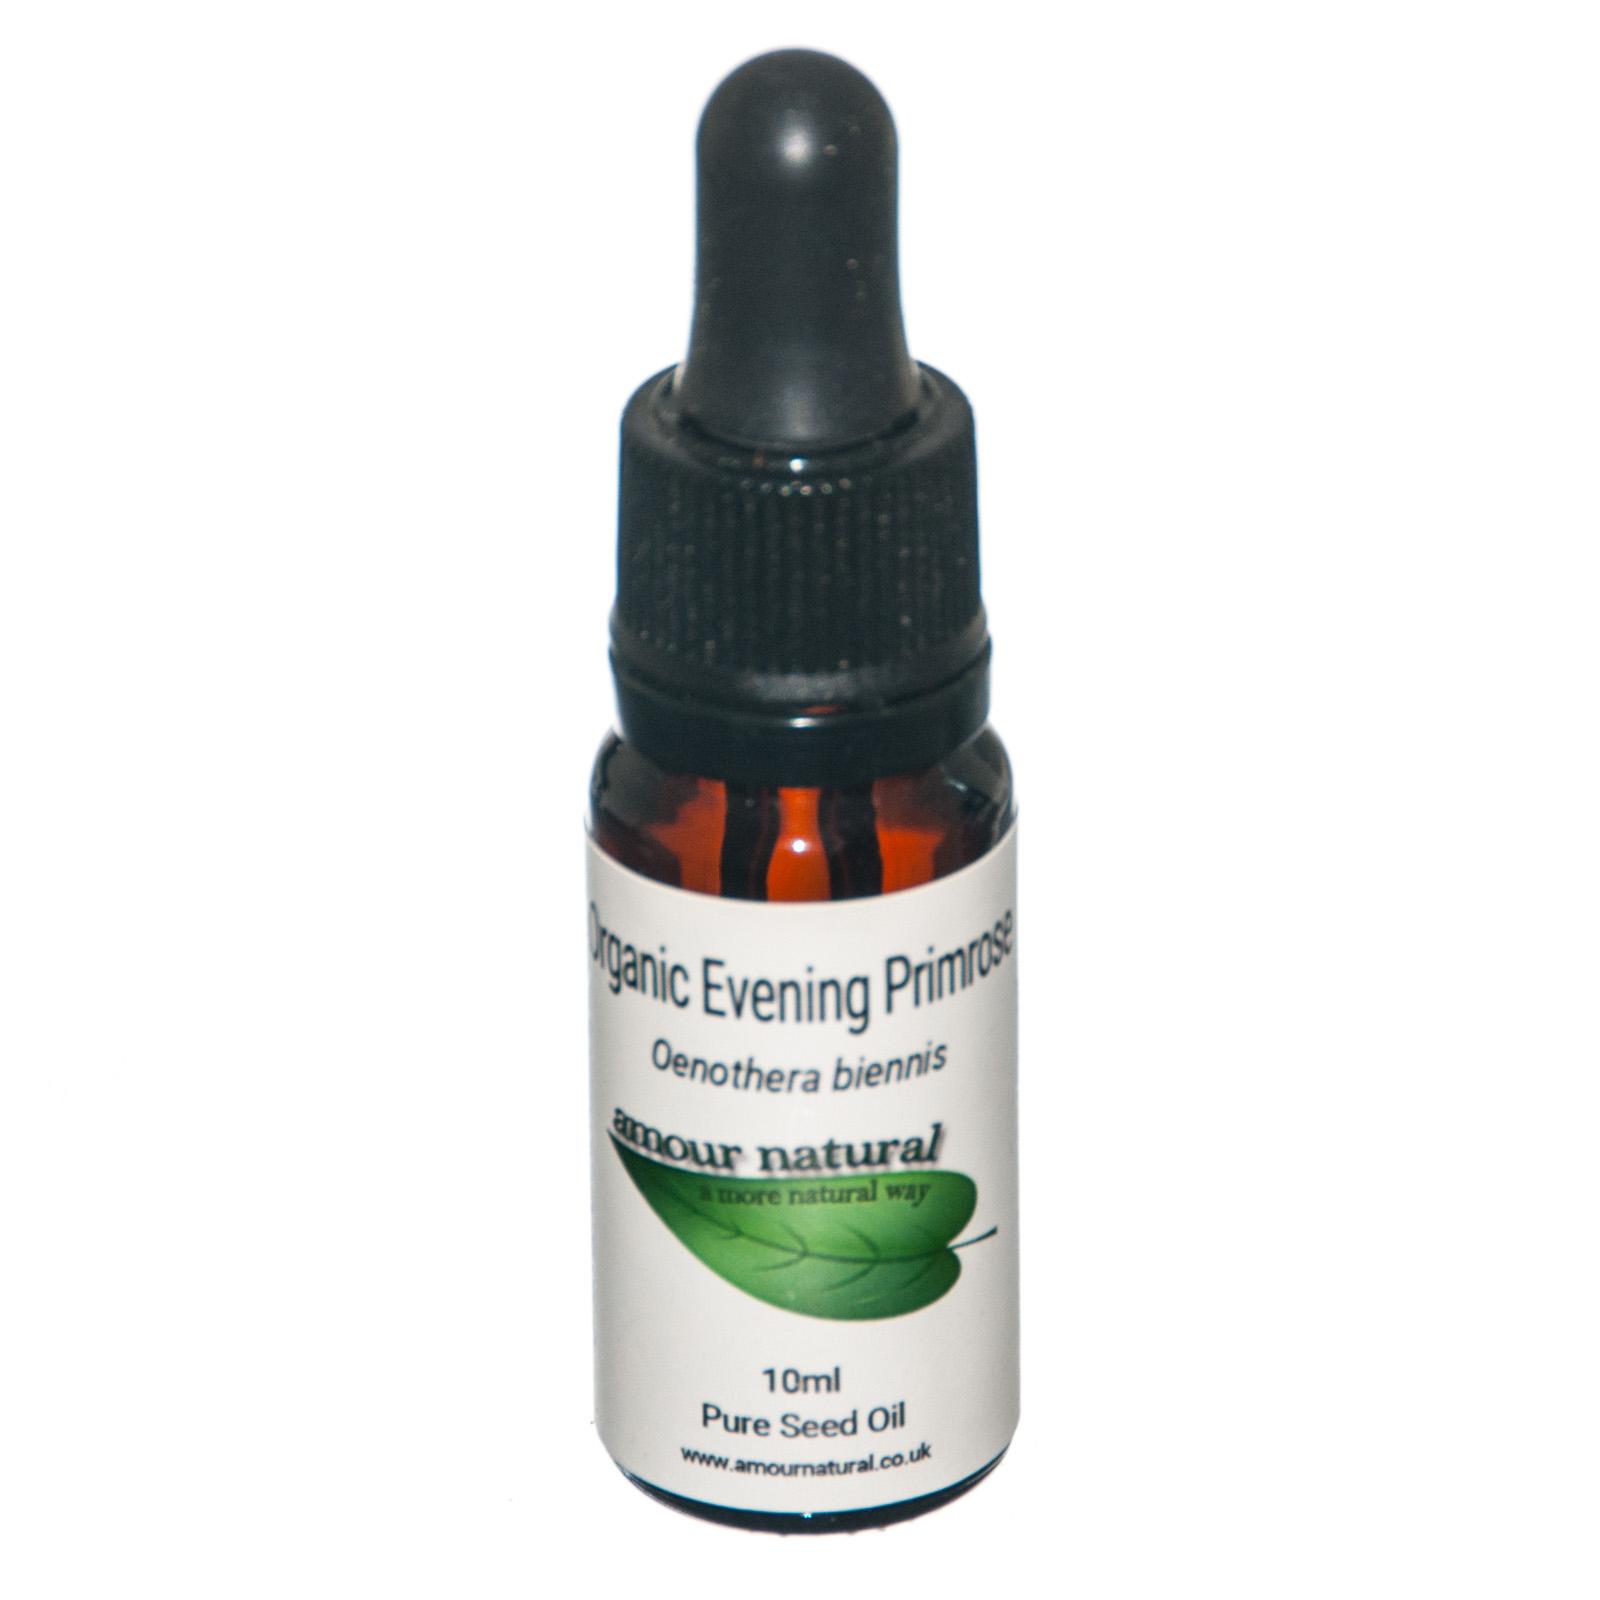 Organic Evening Primrose Oil 10ml